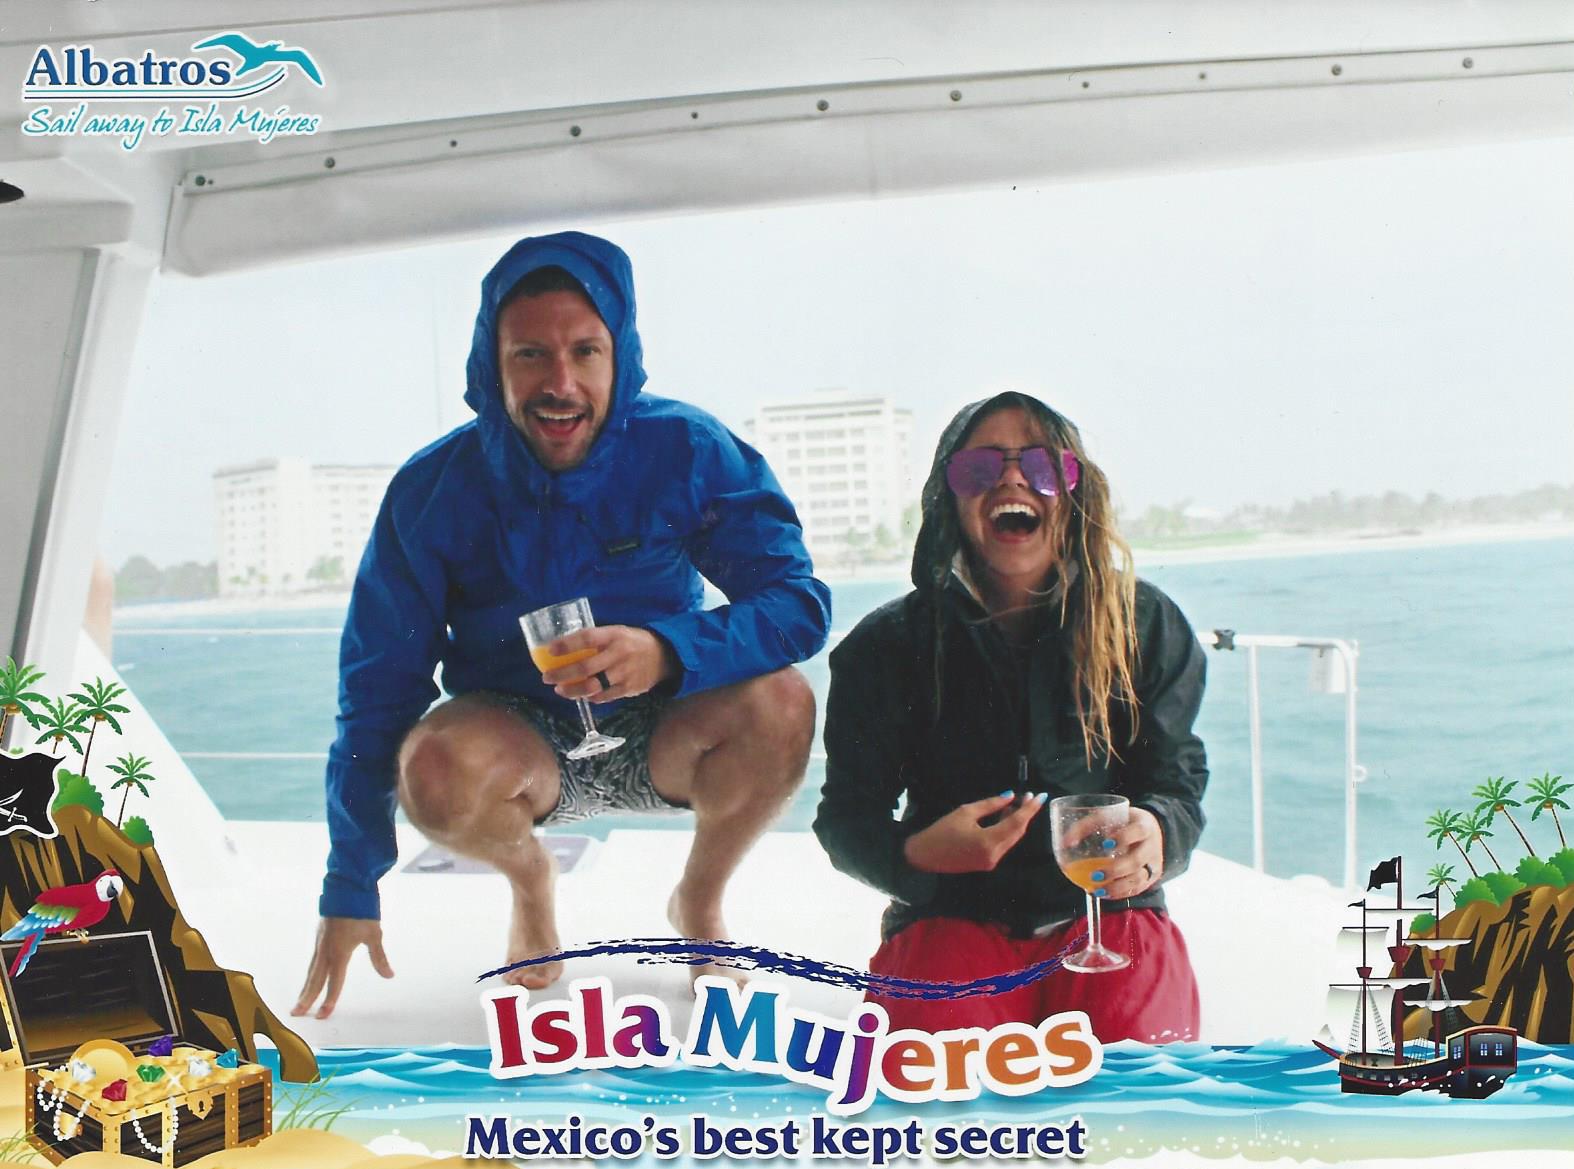 Mike-and-Taylor-on-Catamaran.jpg